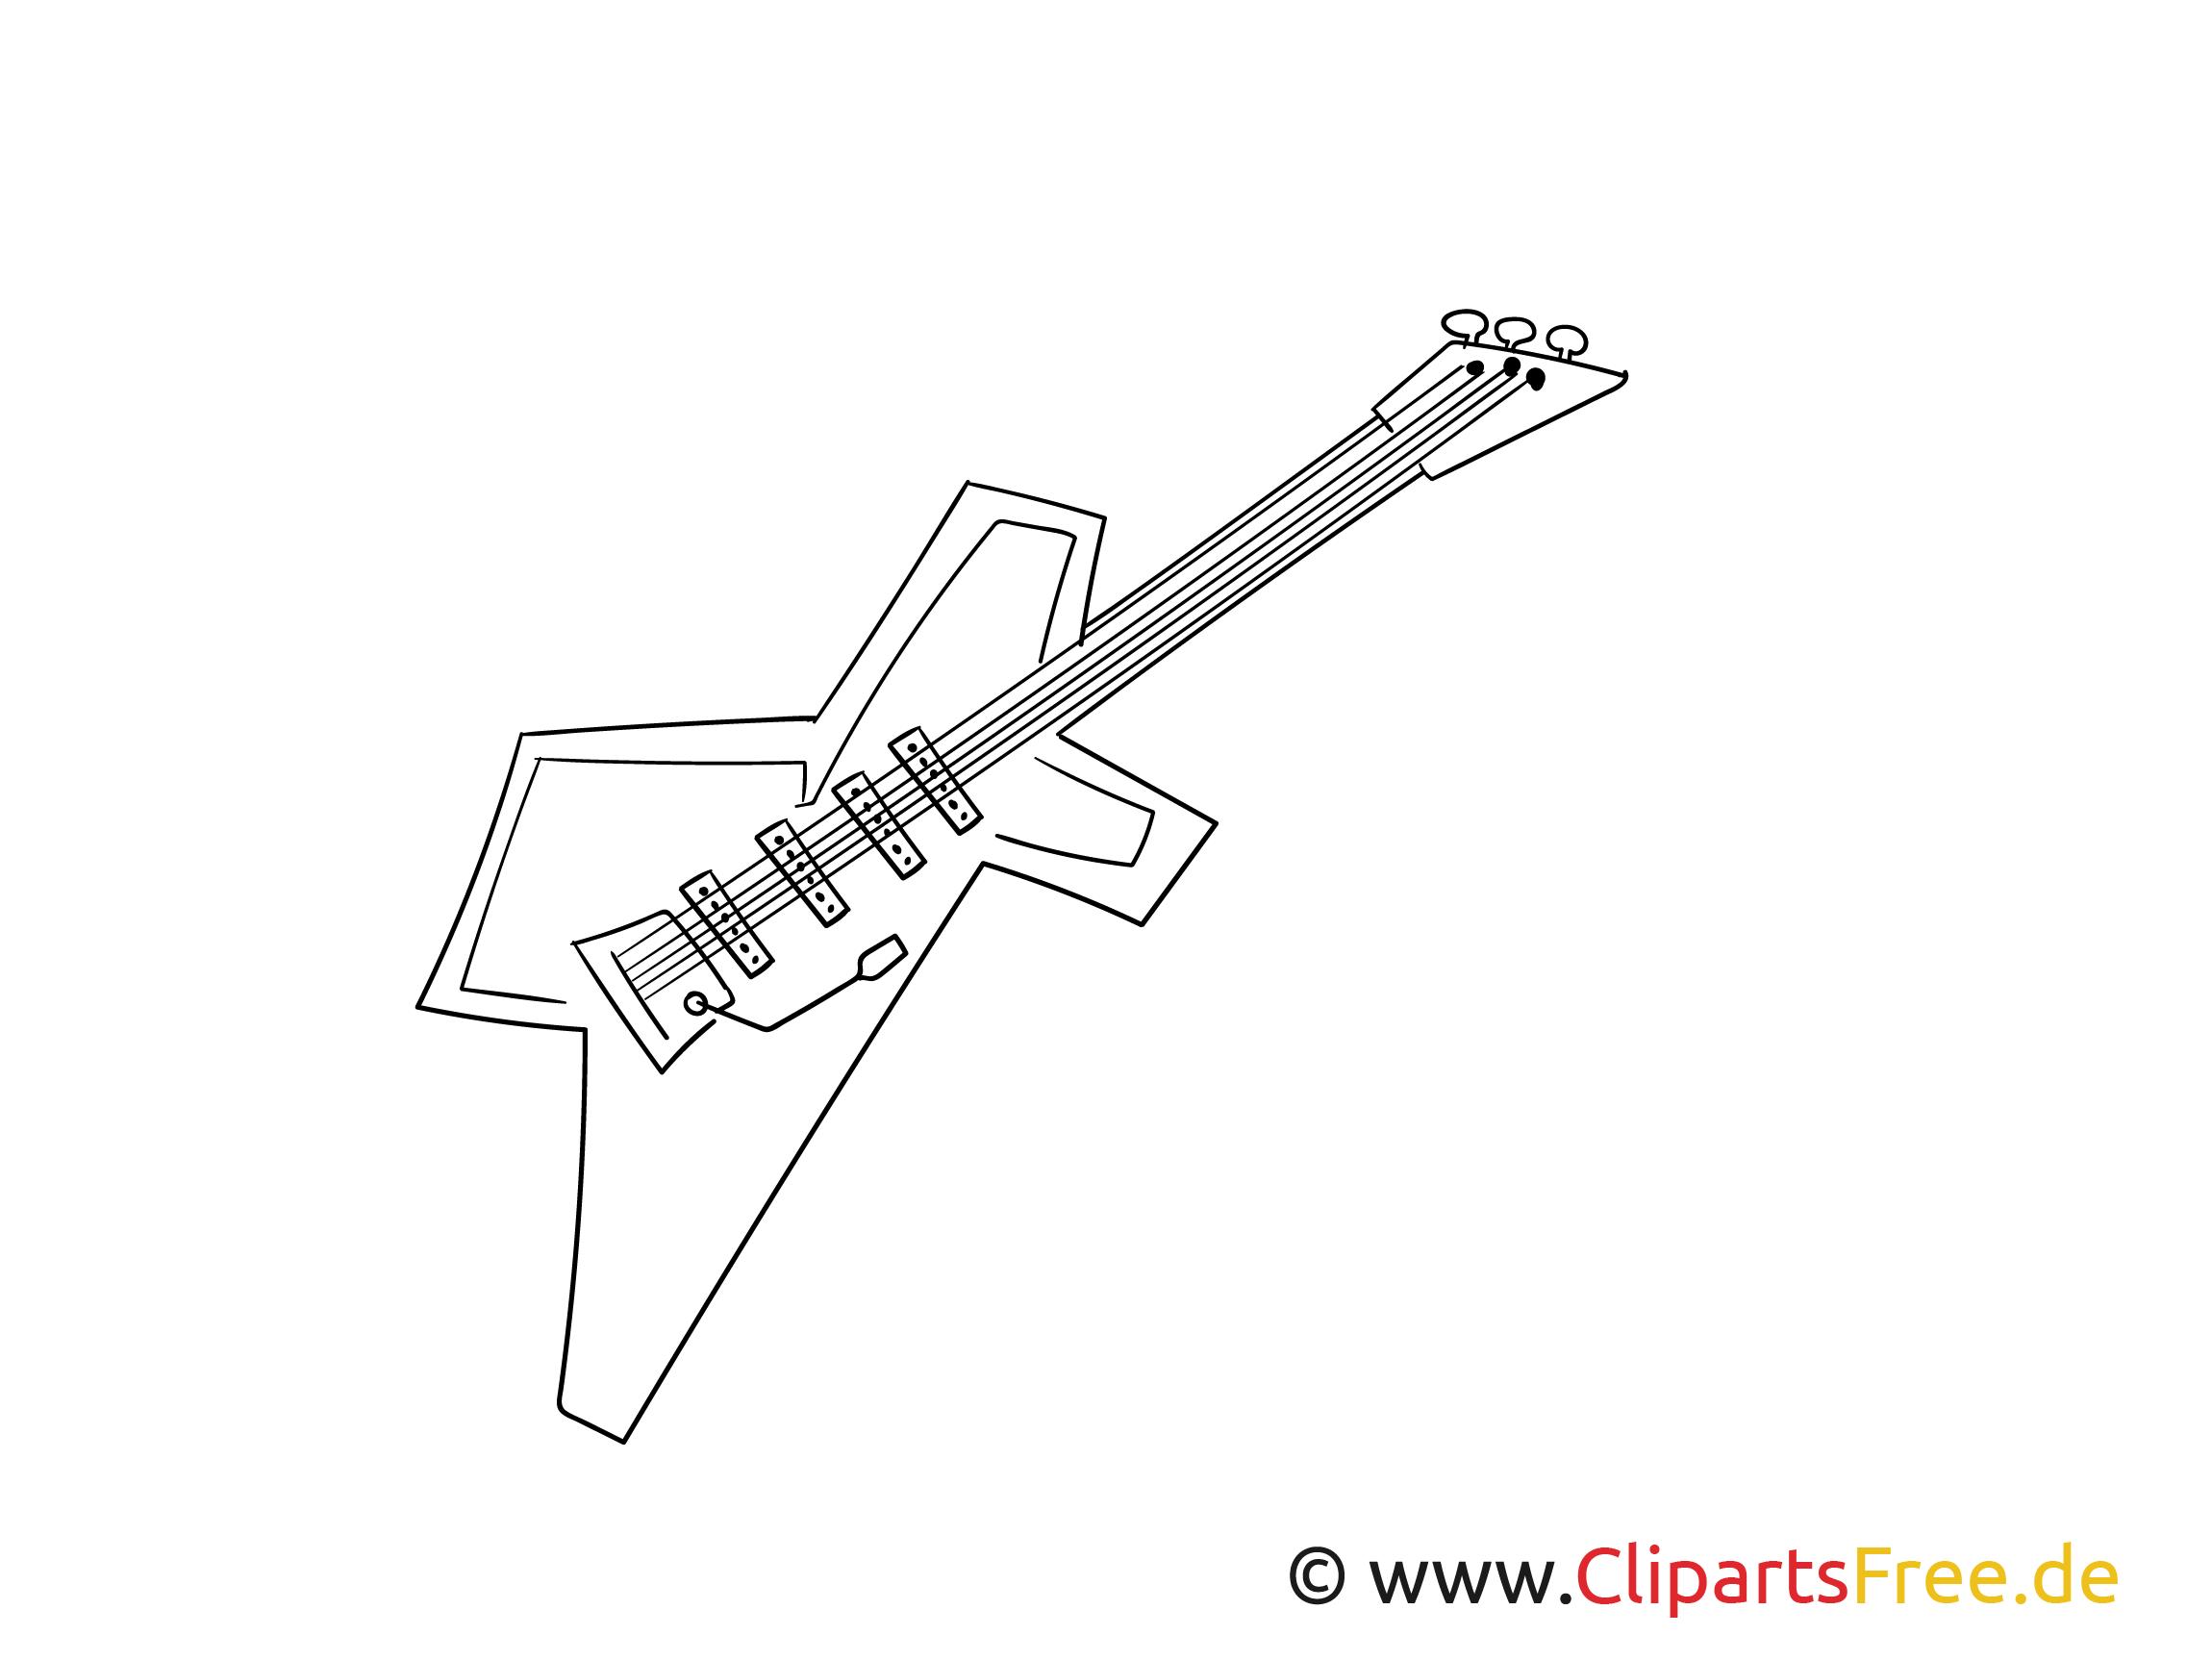 Elektro Gitarre Ausmalbild